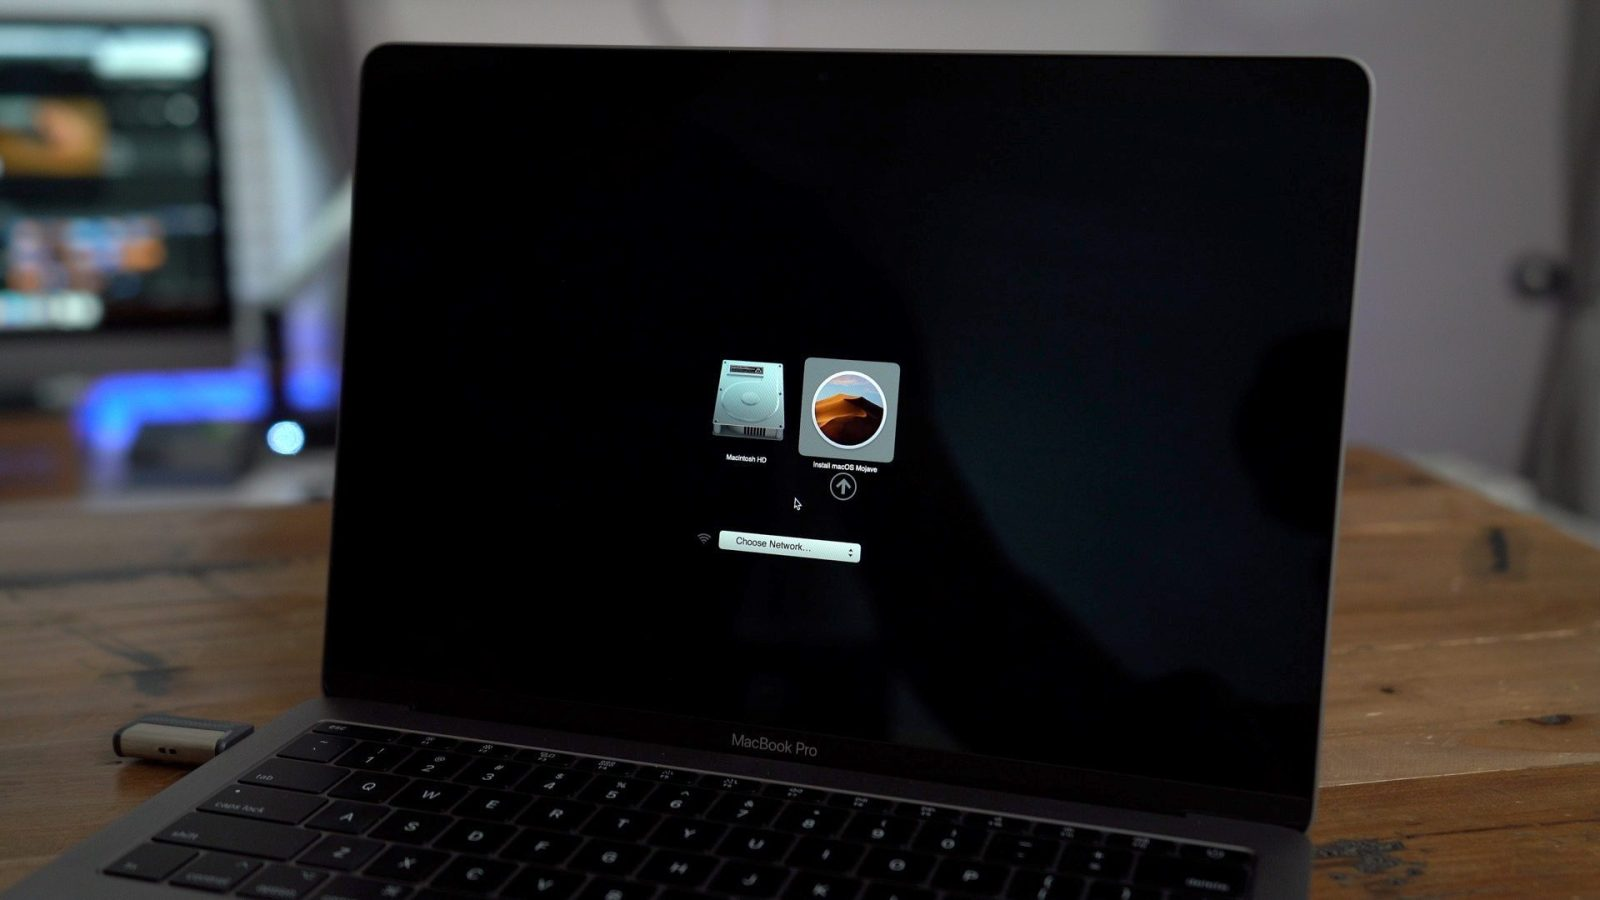 Mac Os 10.14 Mojave Download